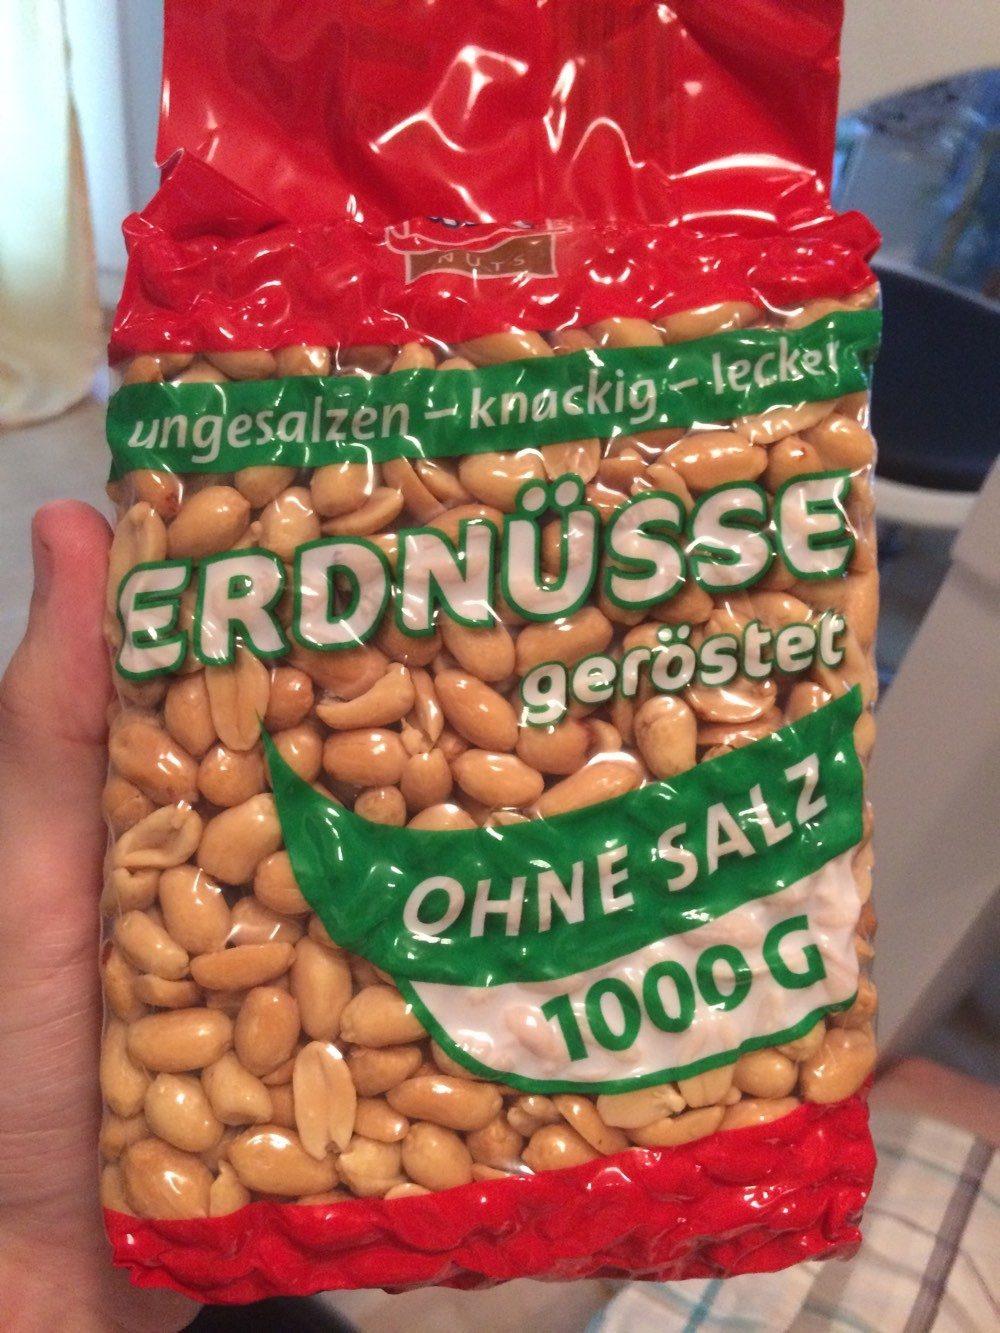 XOX Nuts Erdnüsse geröstet ohne Salz - Produkt